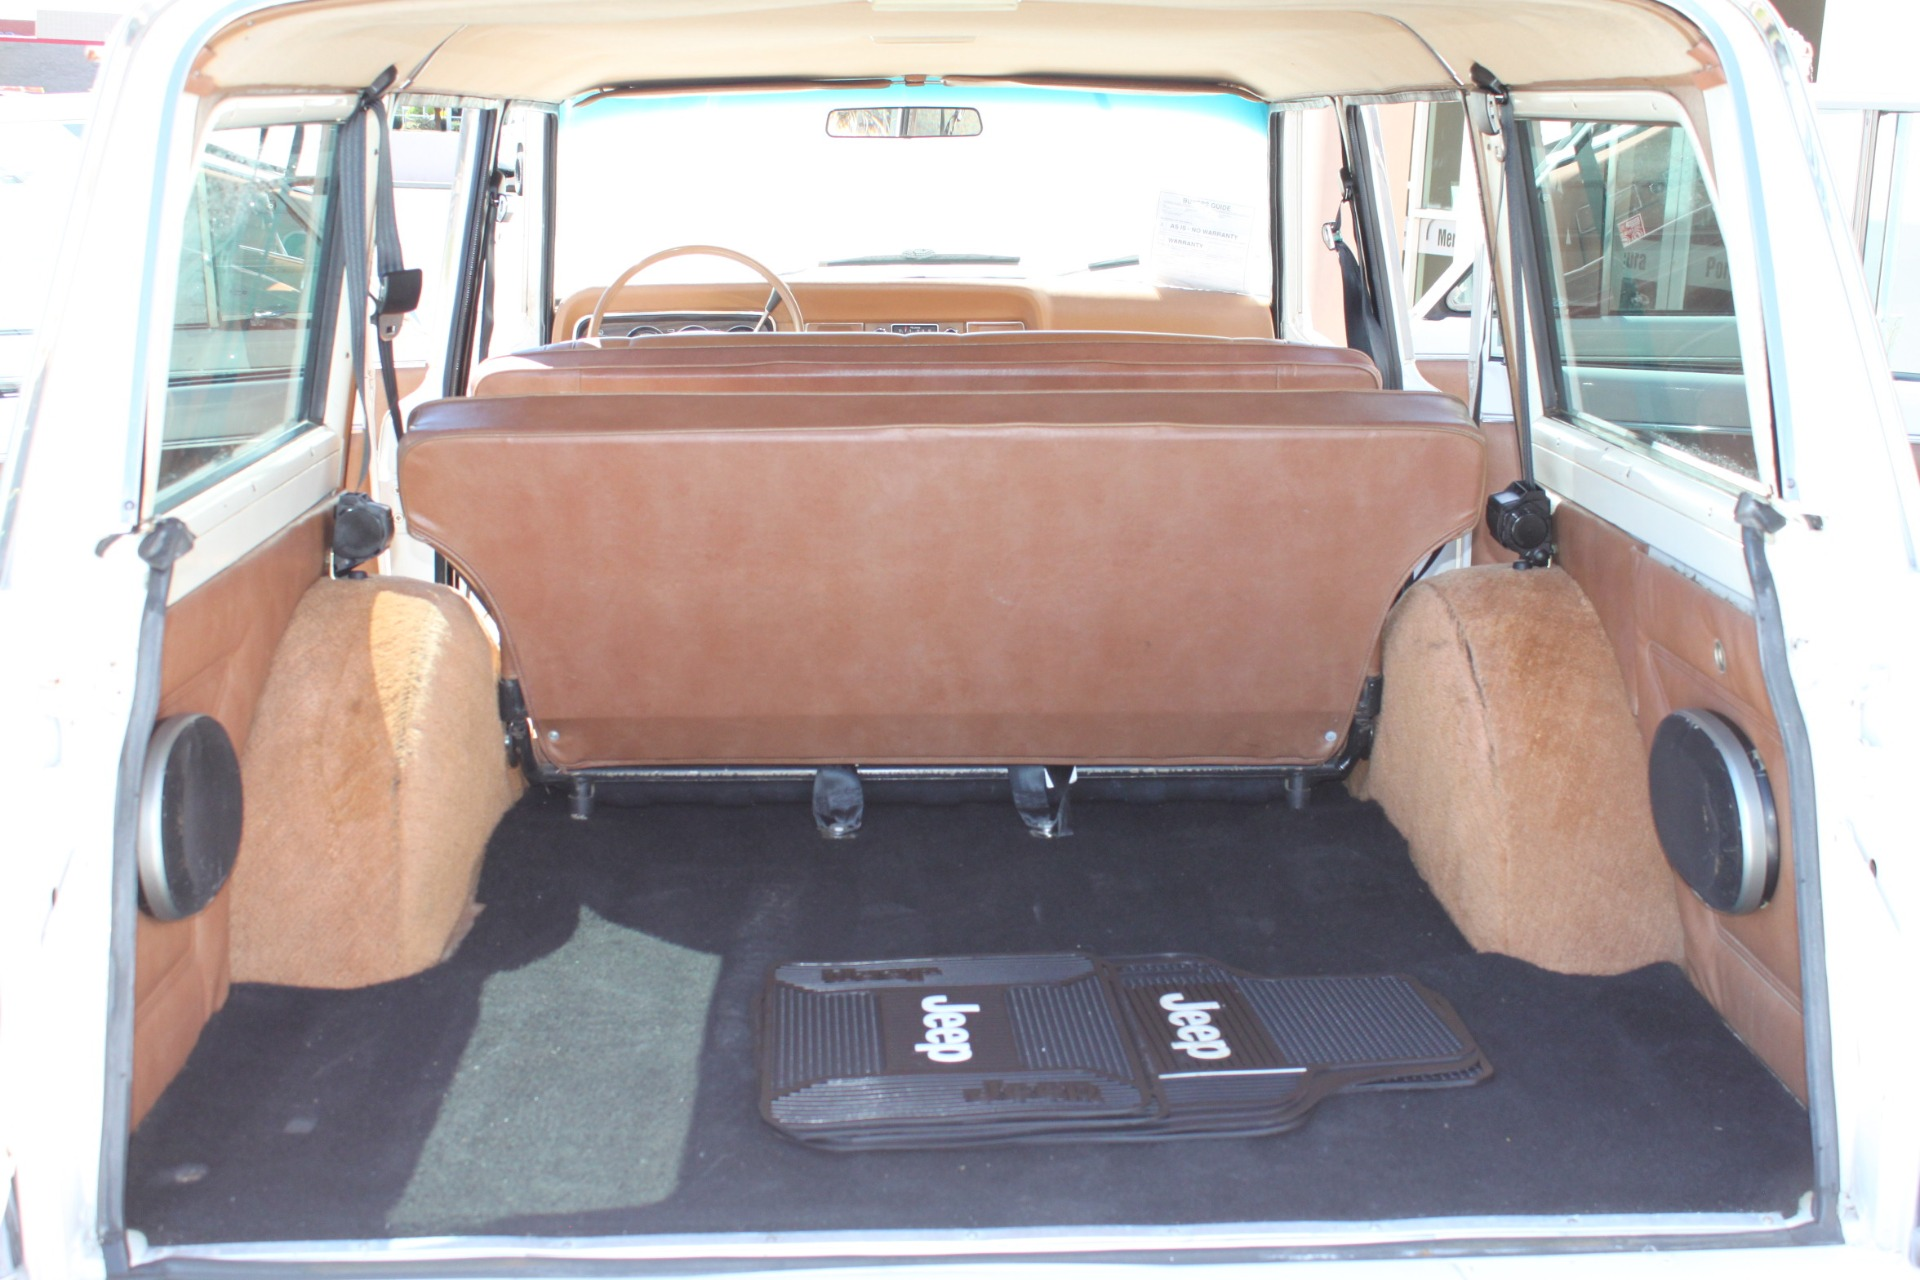 Used-1977-Jeep-Wagoneer-Custom-Fuel-Injected-66-Liter-401-Chevrolet